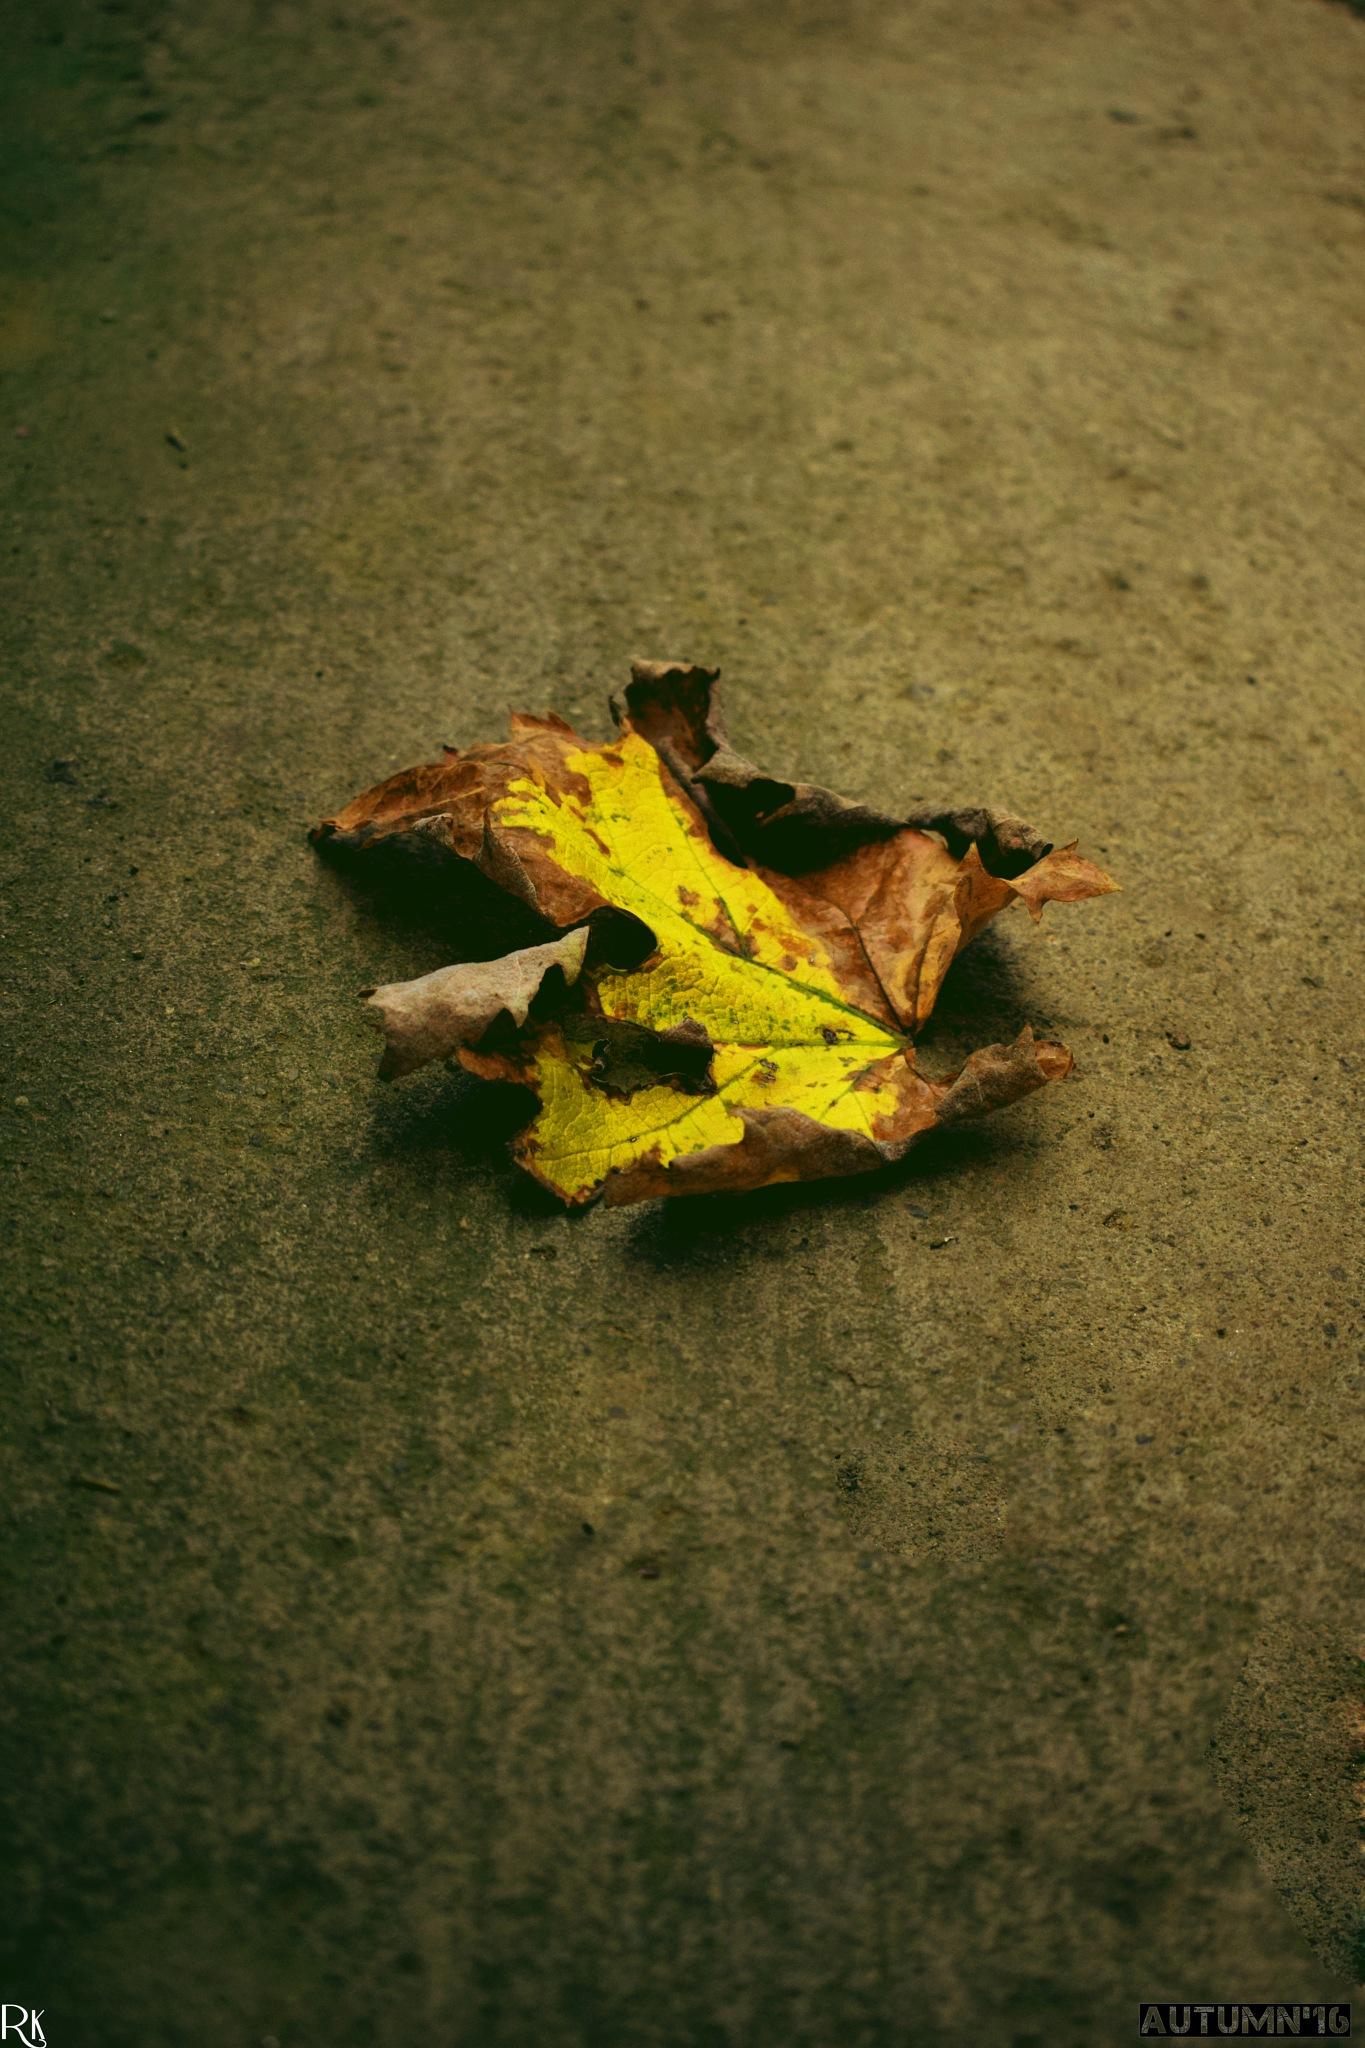 Welcome Autumn'16 @autumn2016 by Robert Krstevski